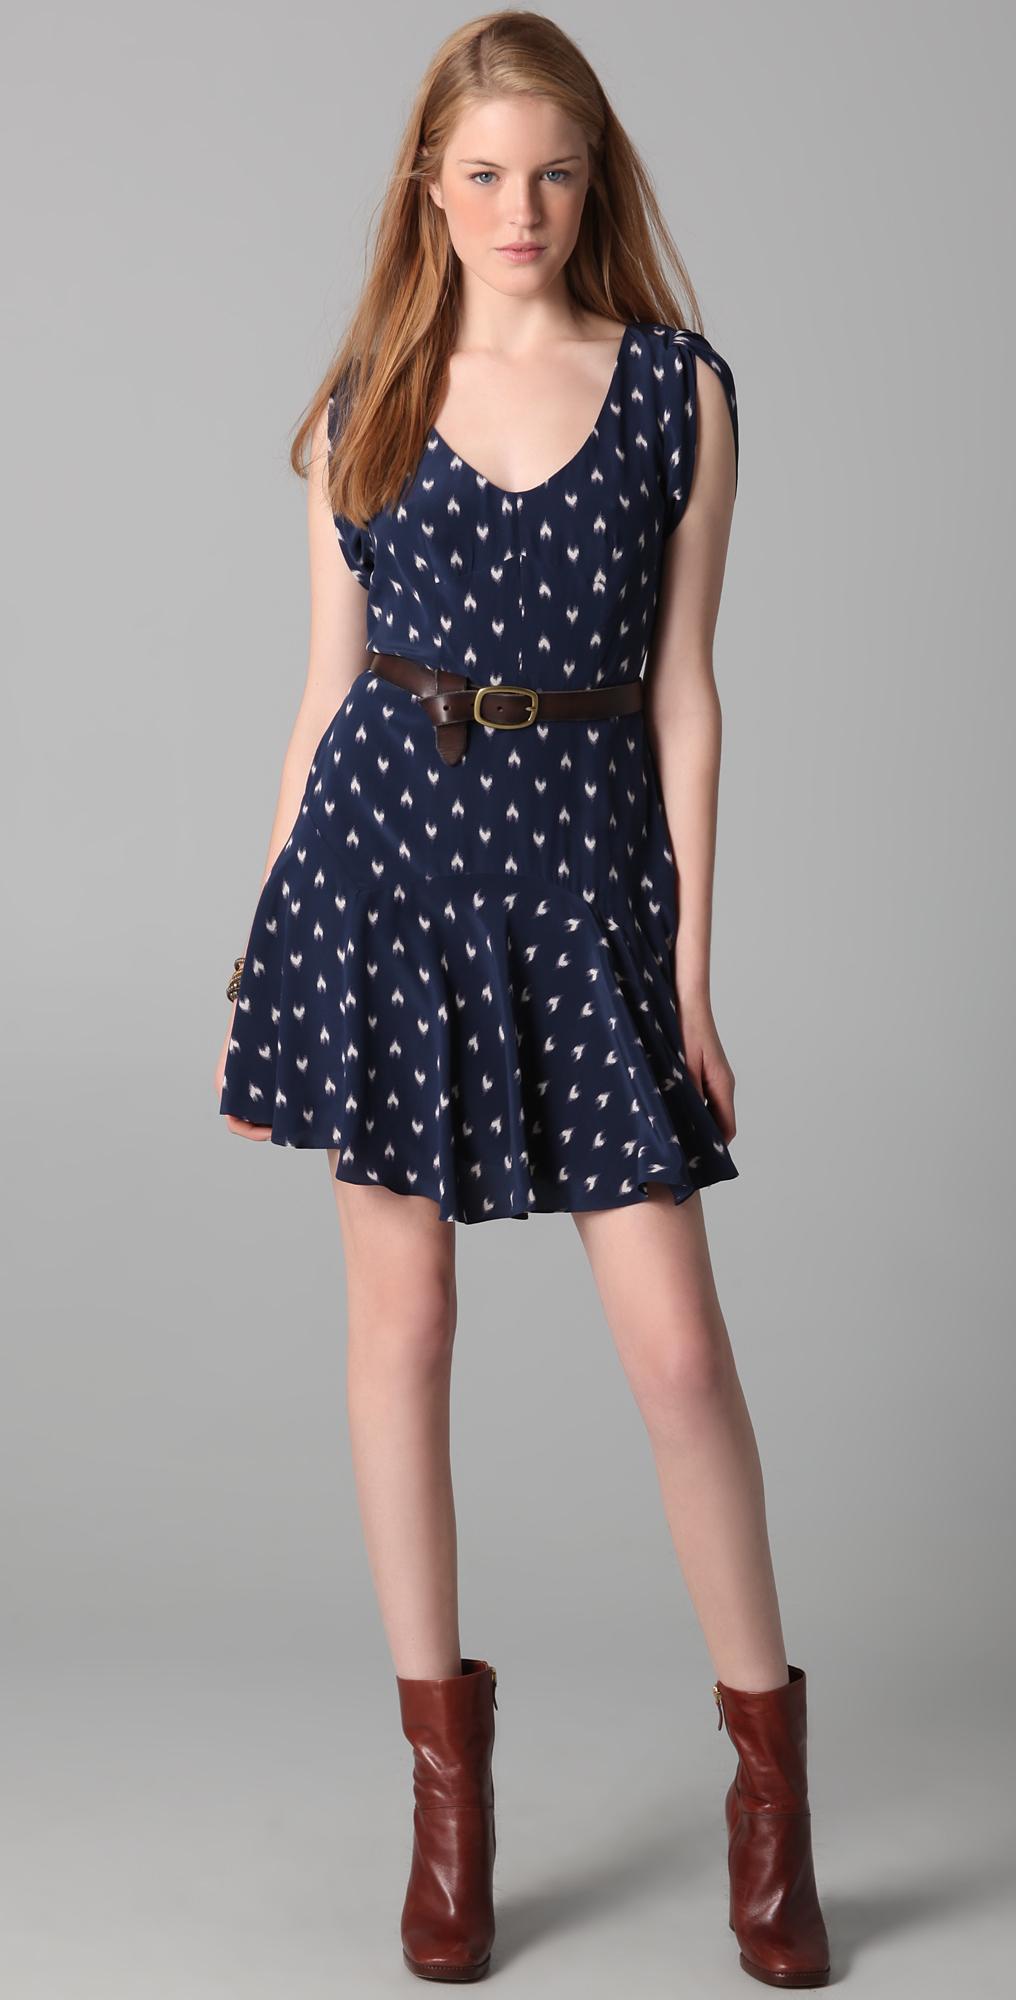 Rebecca Taylor Ikat Heart Printed \'40s Dress | SHOPBOP